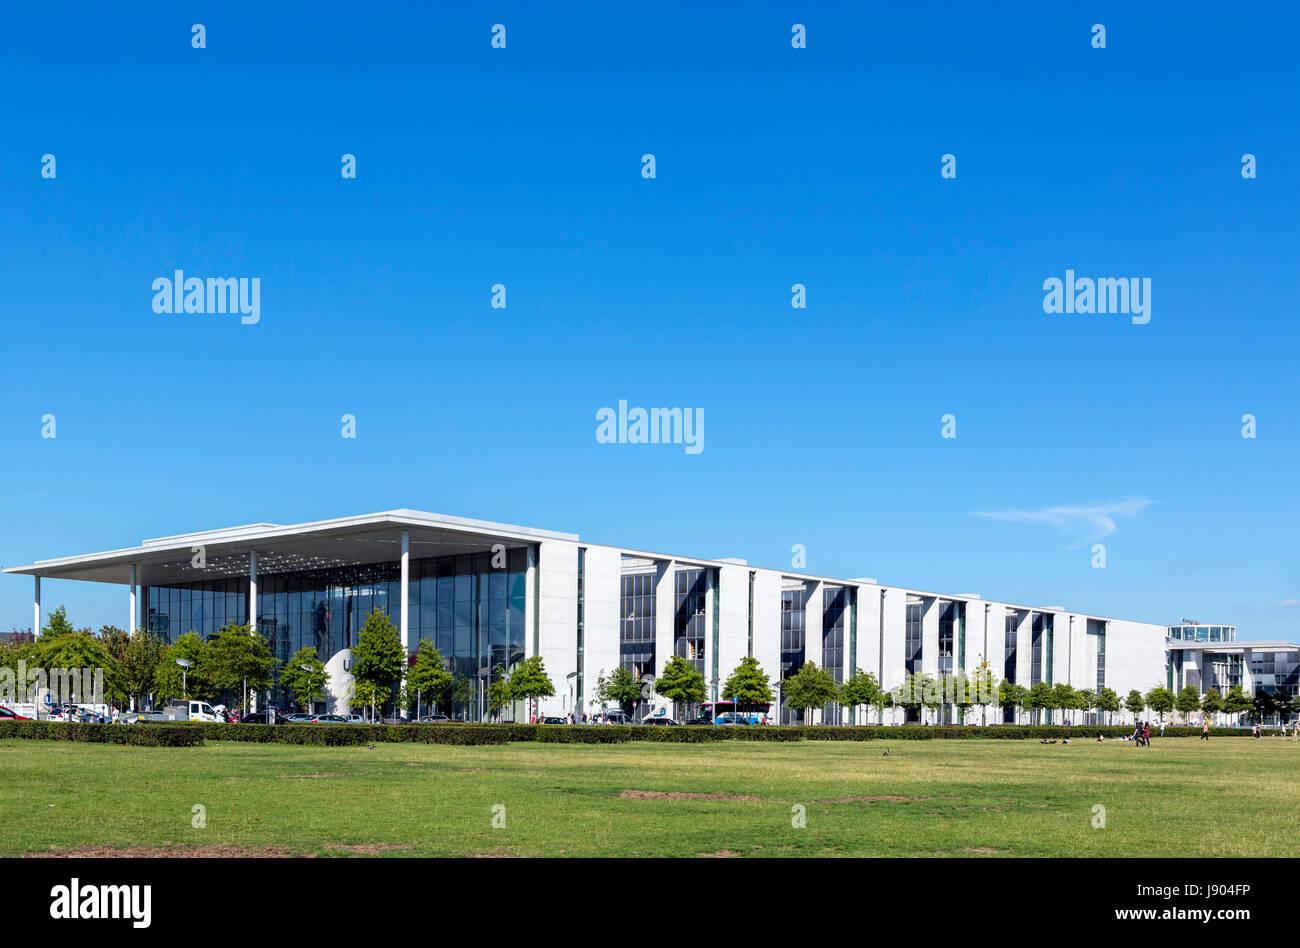 The Paul Löbe Building of the German Parliament (Bundestag), Mitte, Berlin, Germany - Stock Image